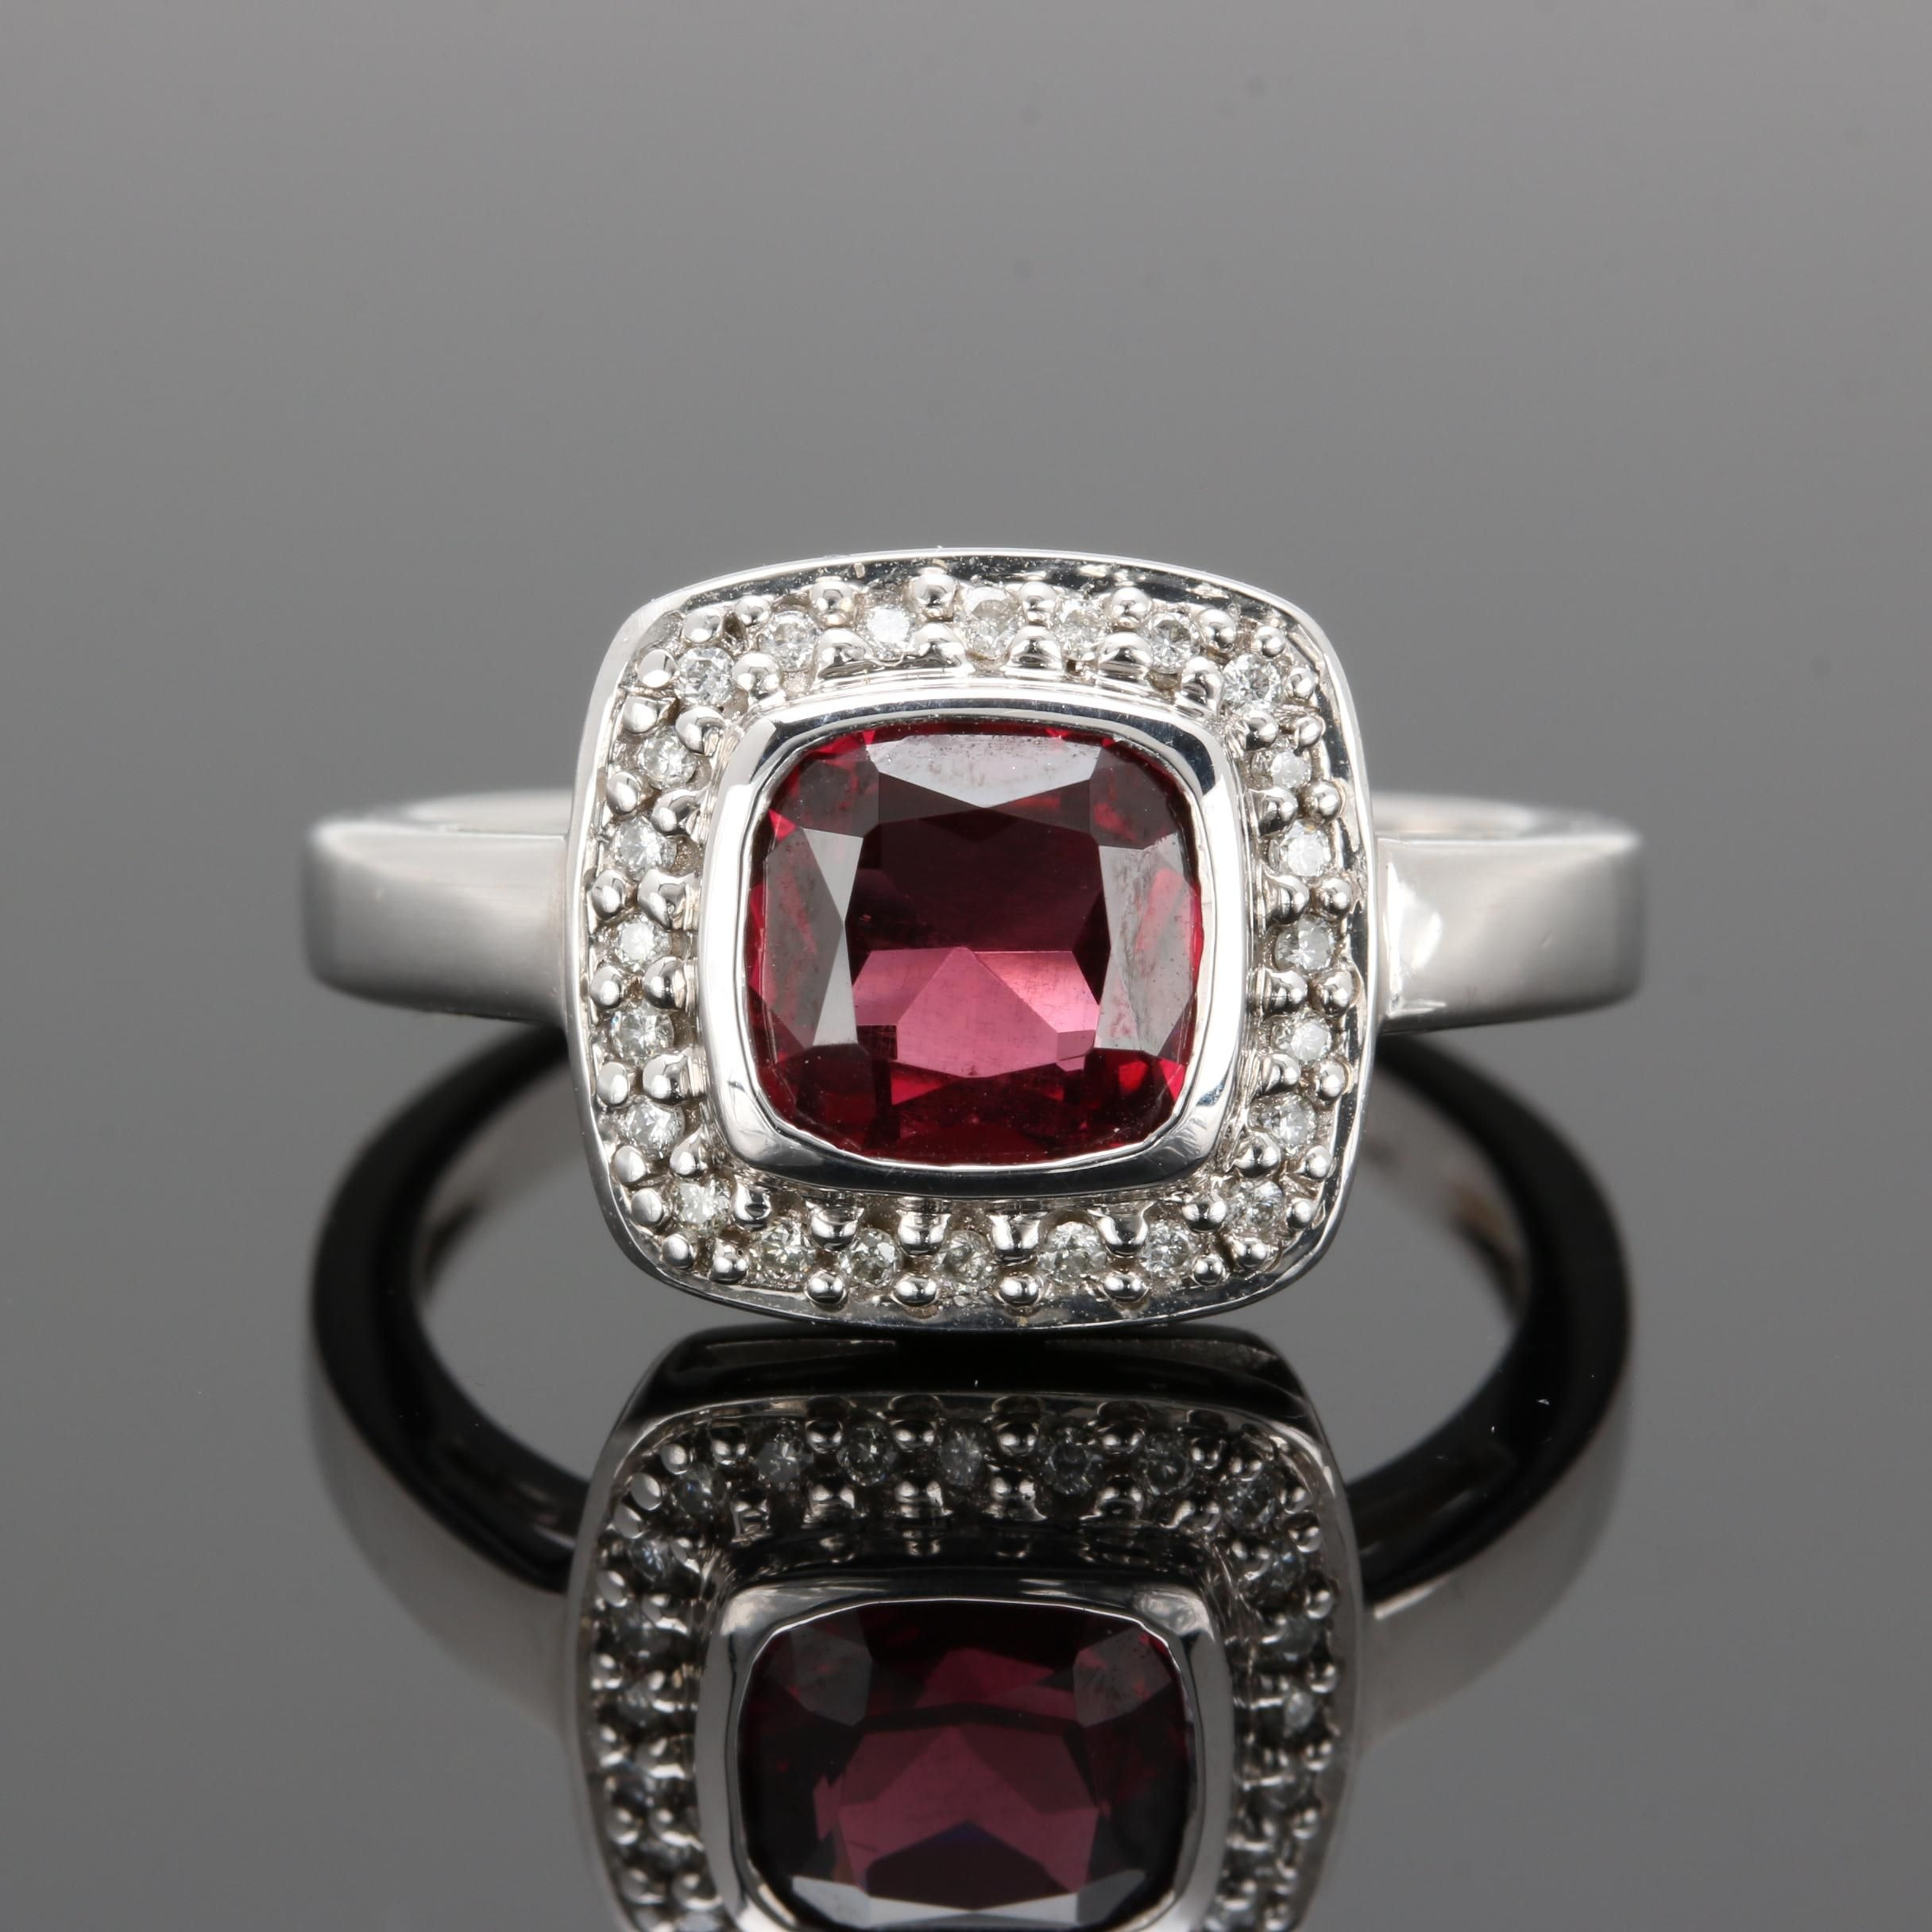 Krementz 14K White Gold Rhodolite Garnet and Diamond Ring